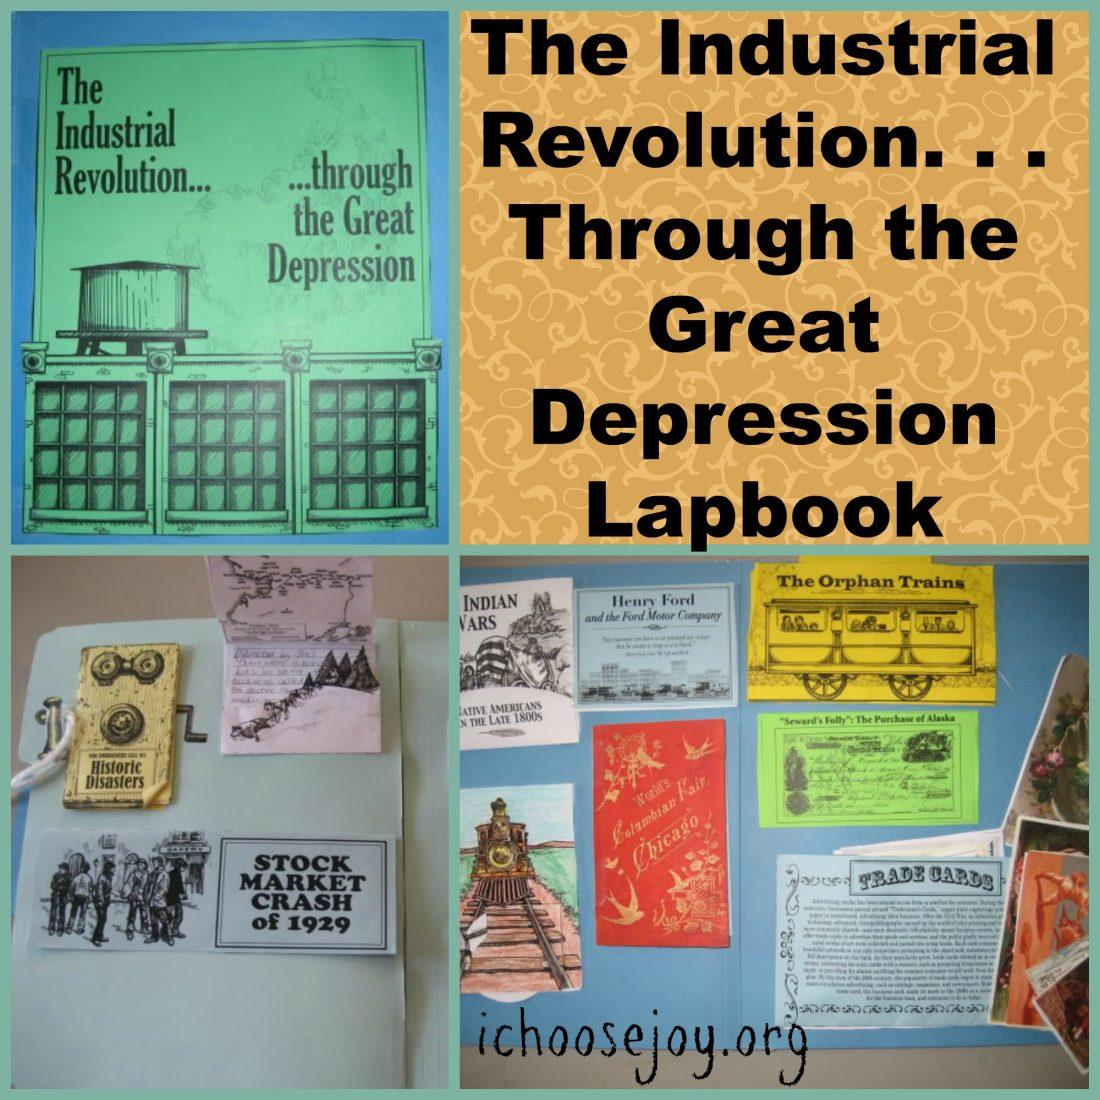 Industrial Revolution Through Great Depression lapbook